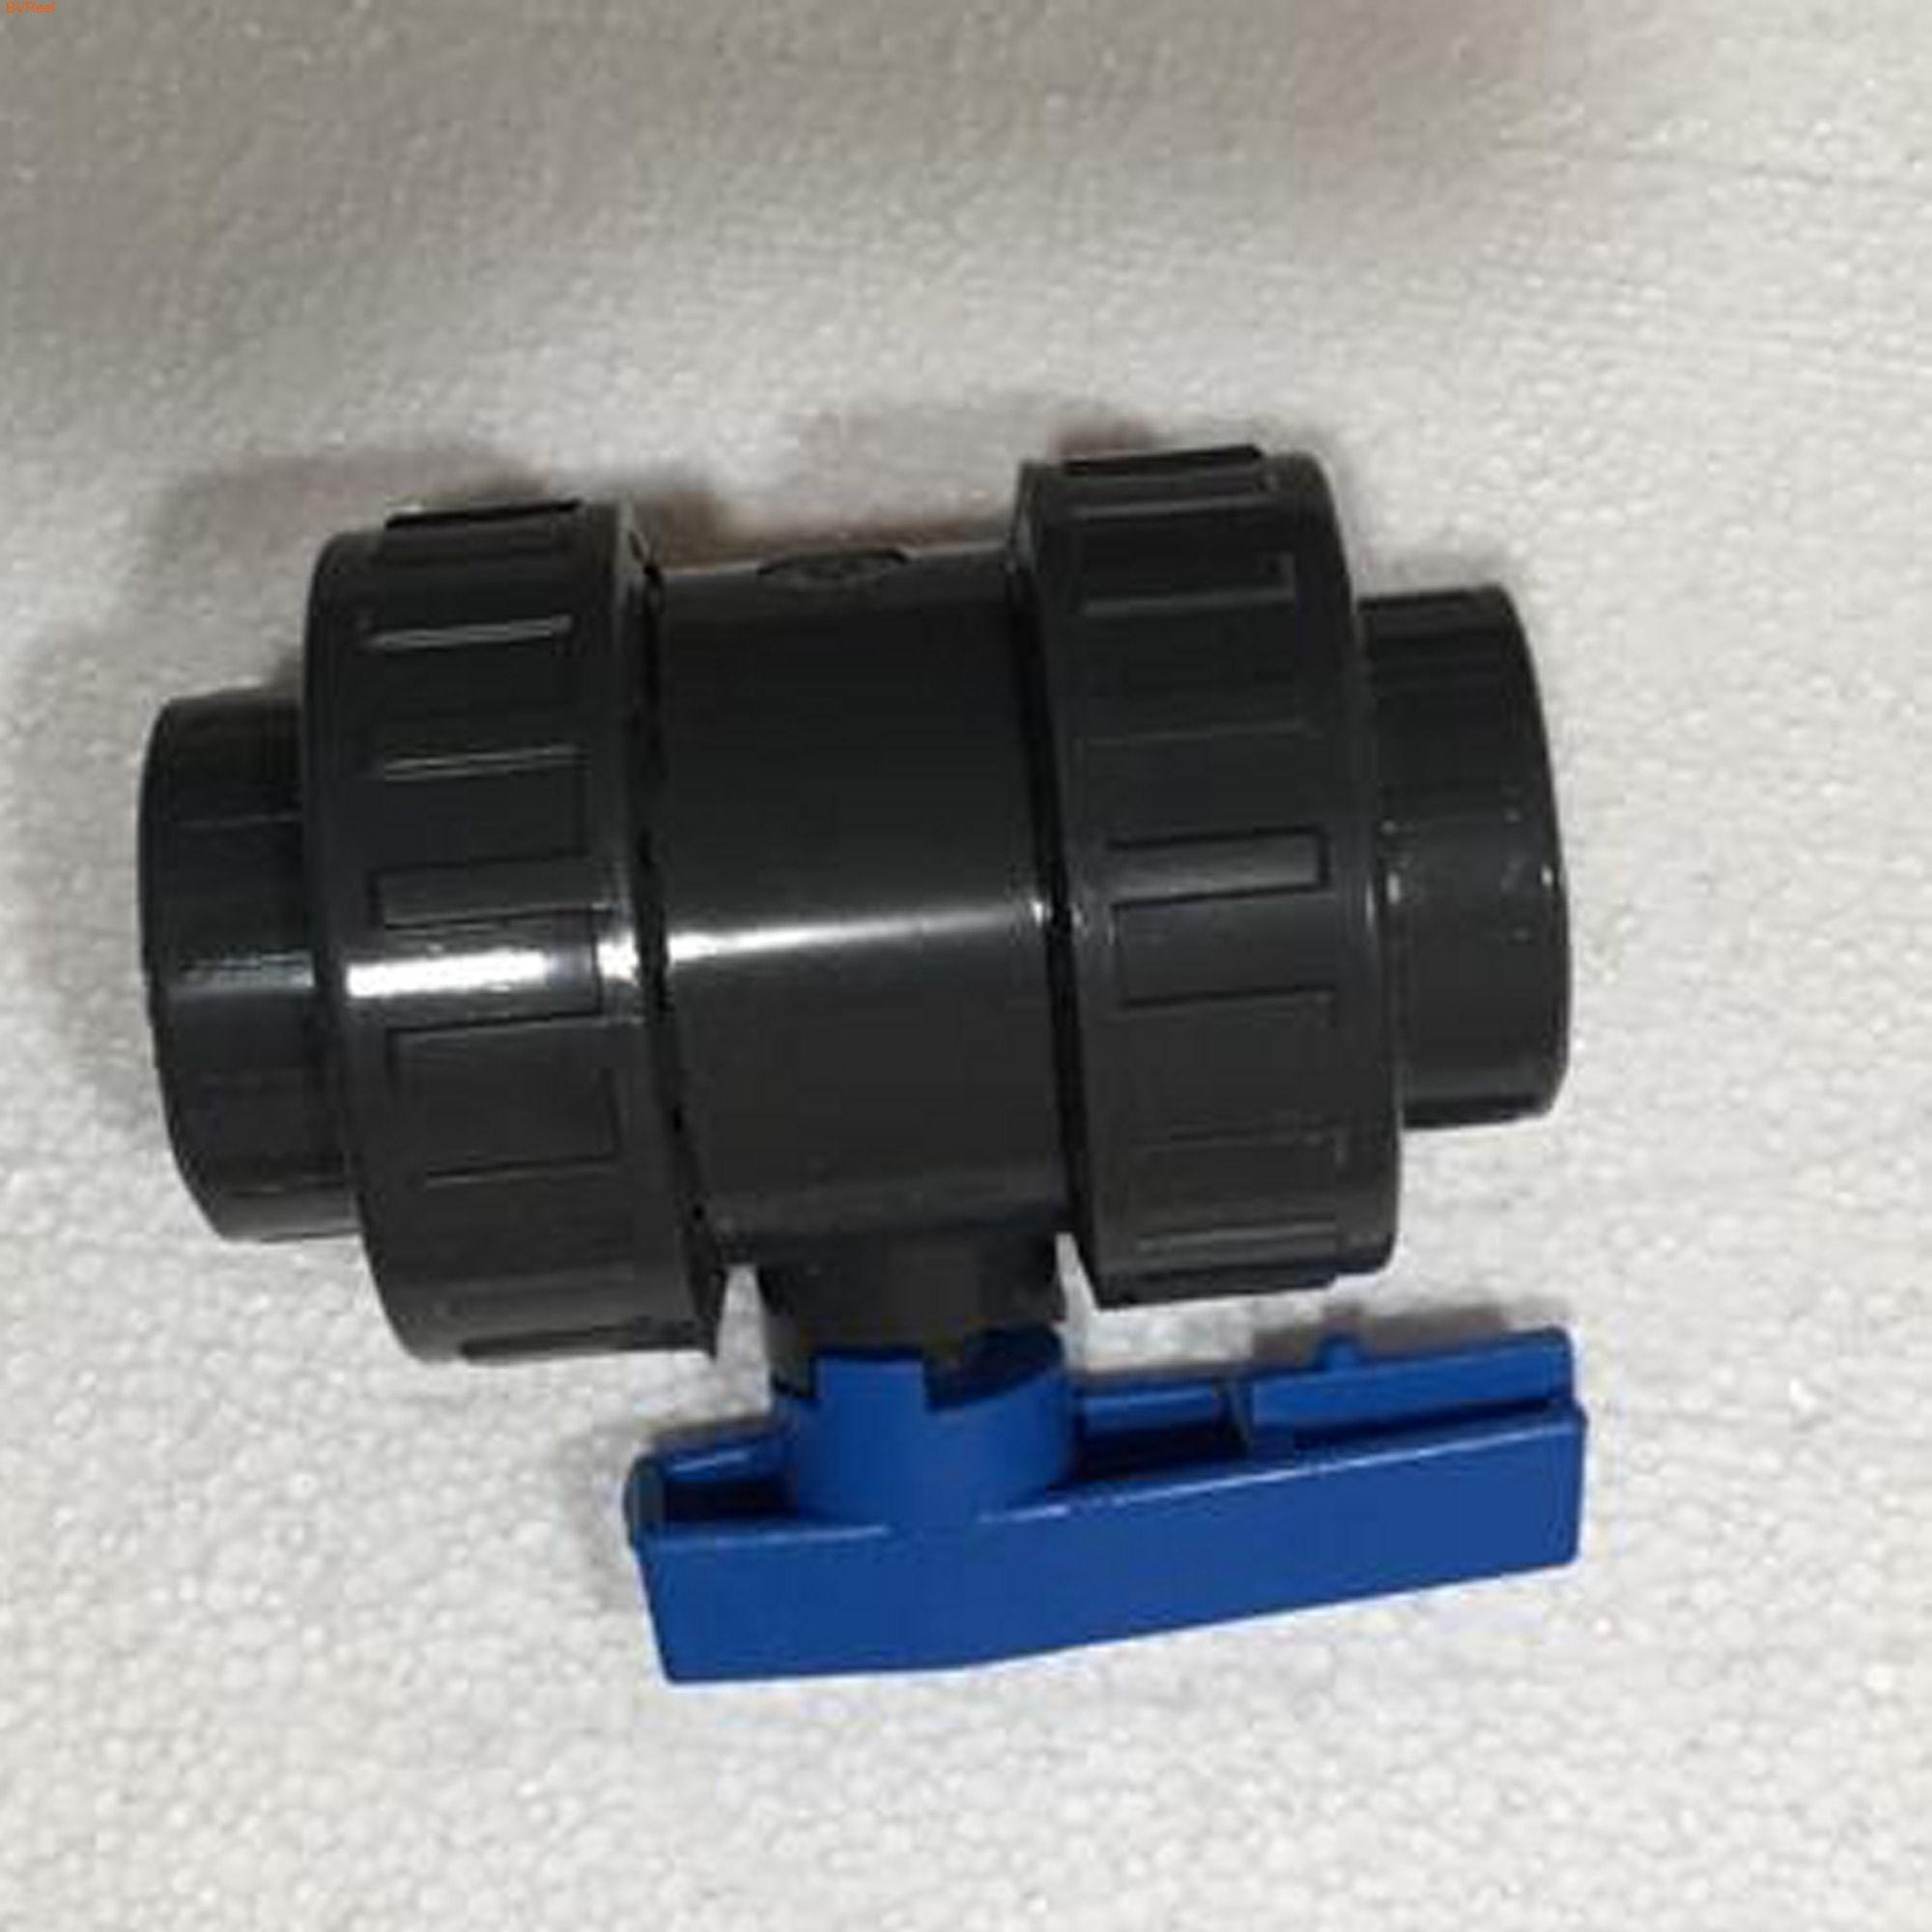 Кран шаровый ПВХ разборный под трубу 32 мм